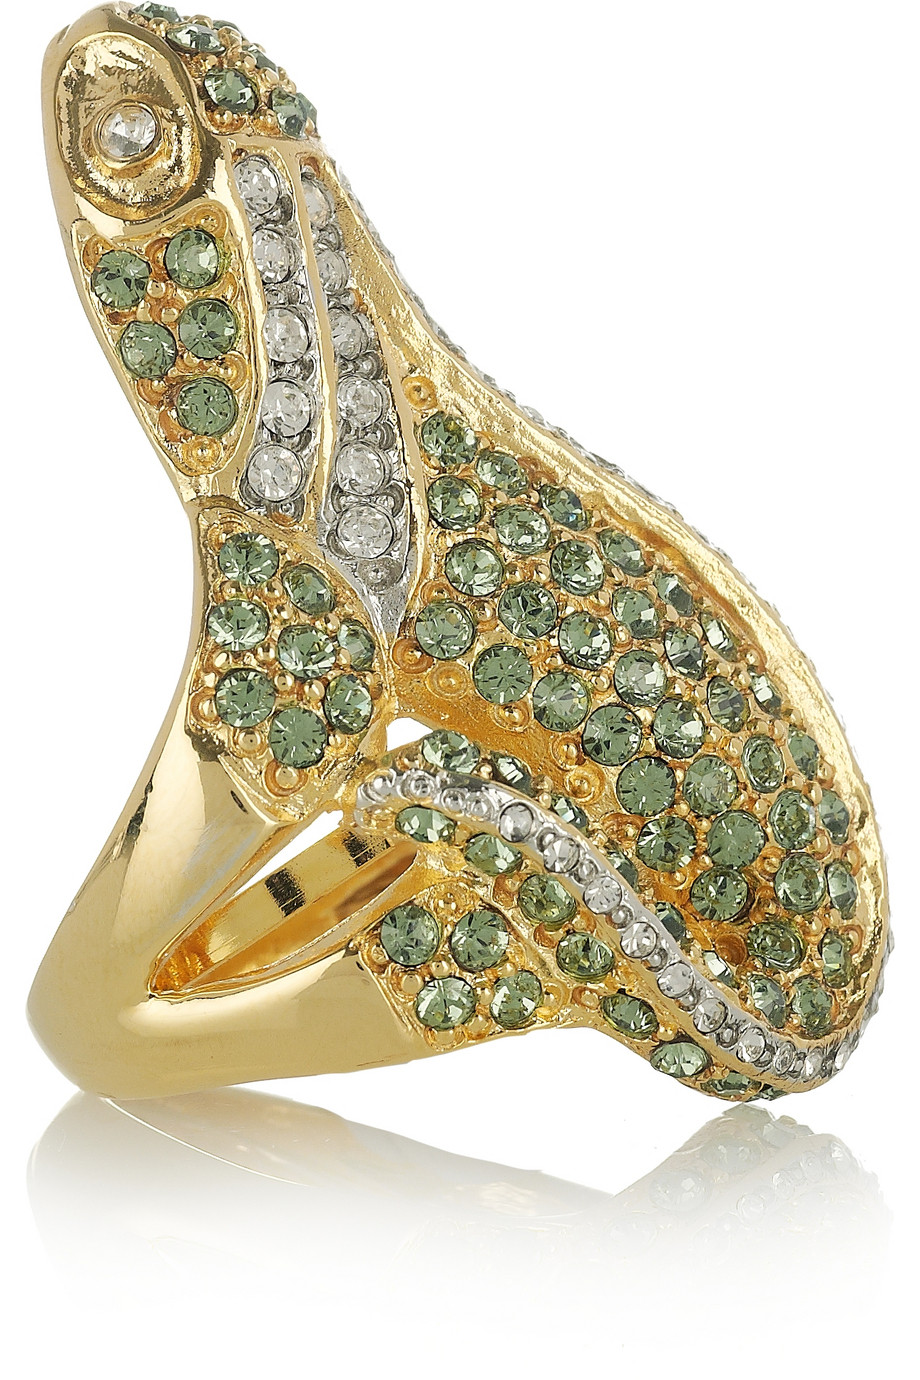 lyst kenneth jay lane 22karat goldplated crystal iguana ring in green. Black Bedroom Furniture Sets. Home Design Ideas